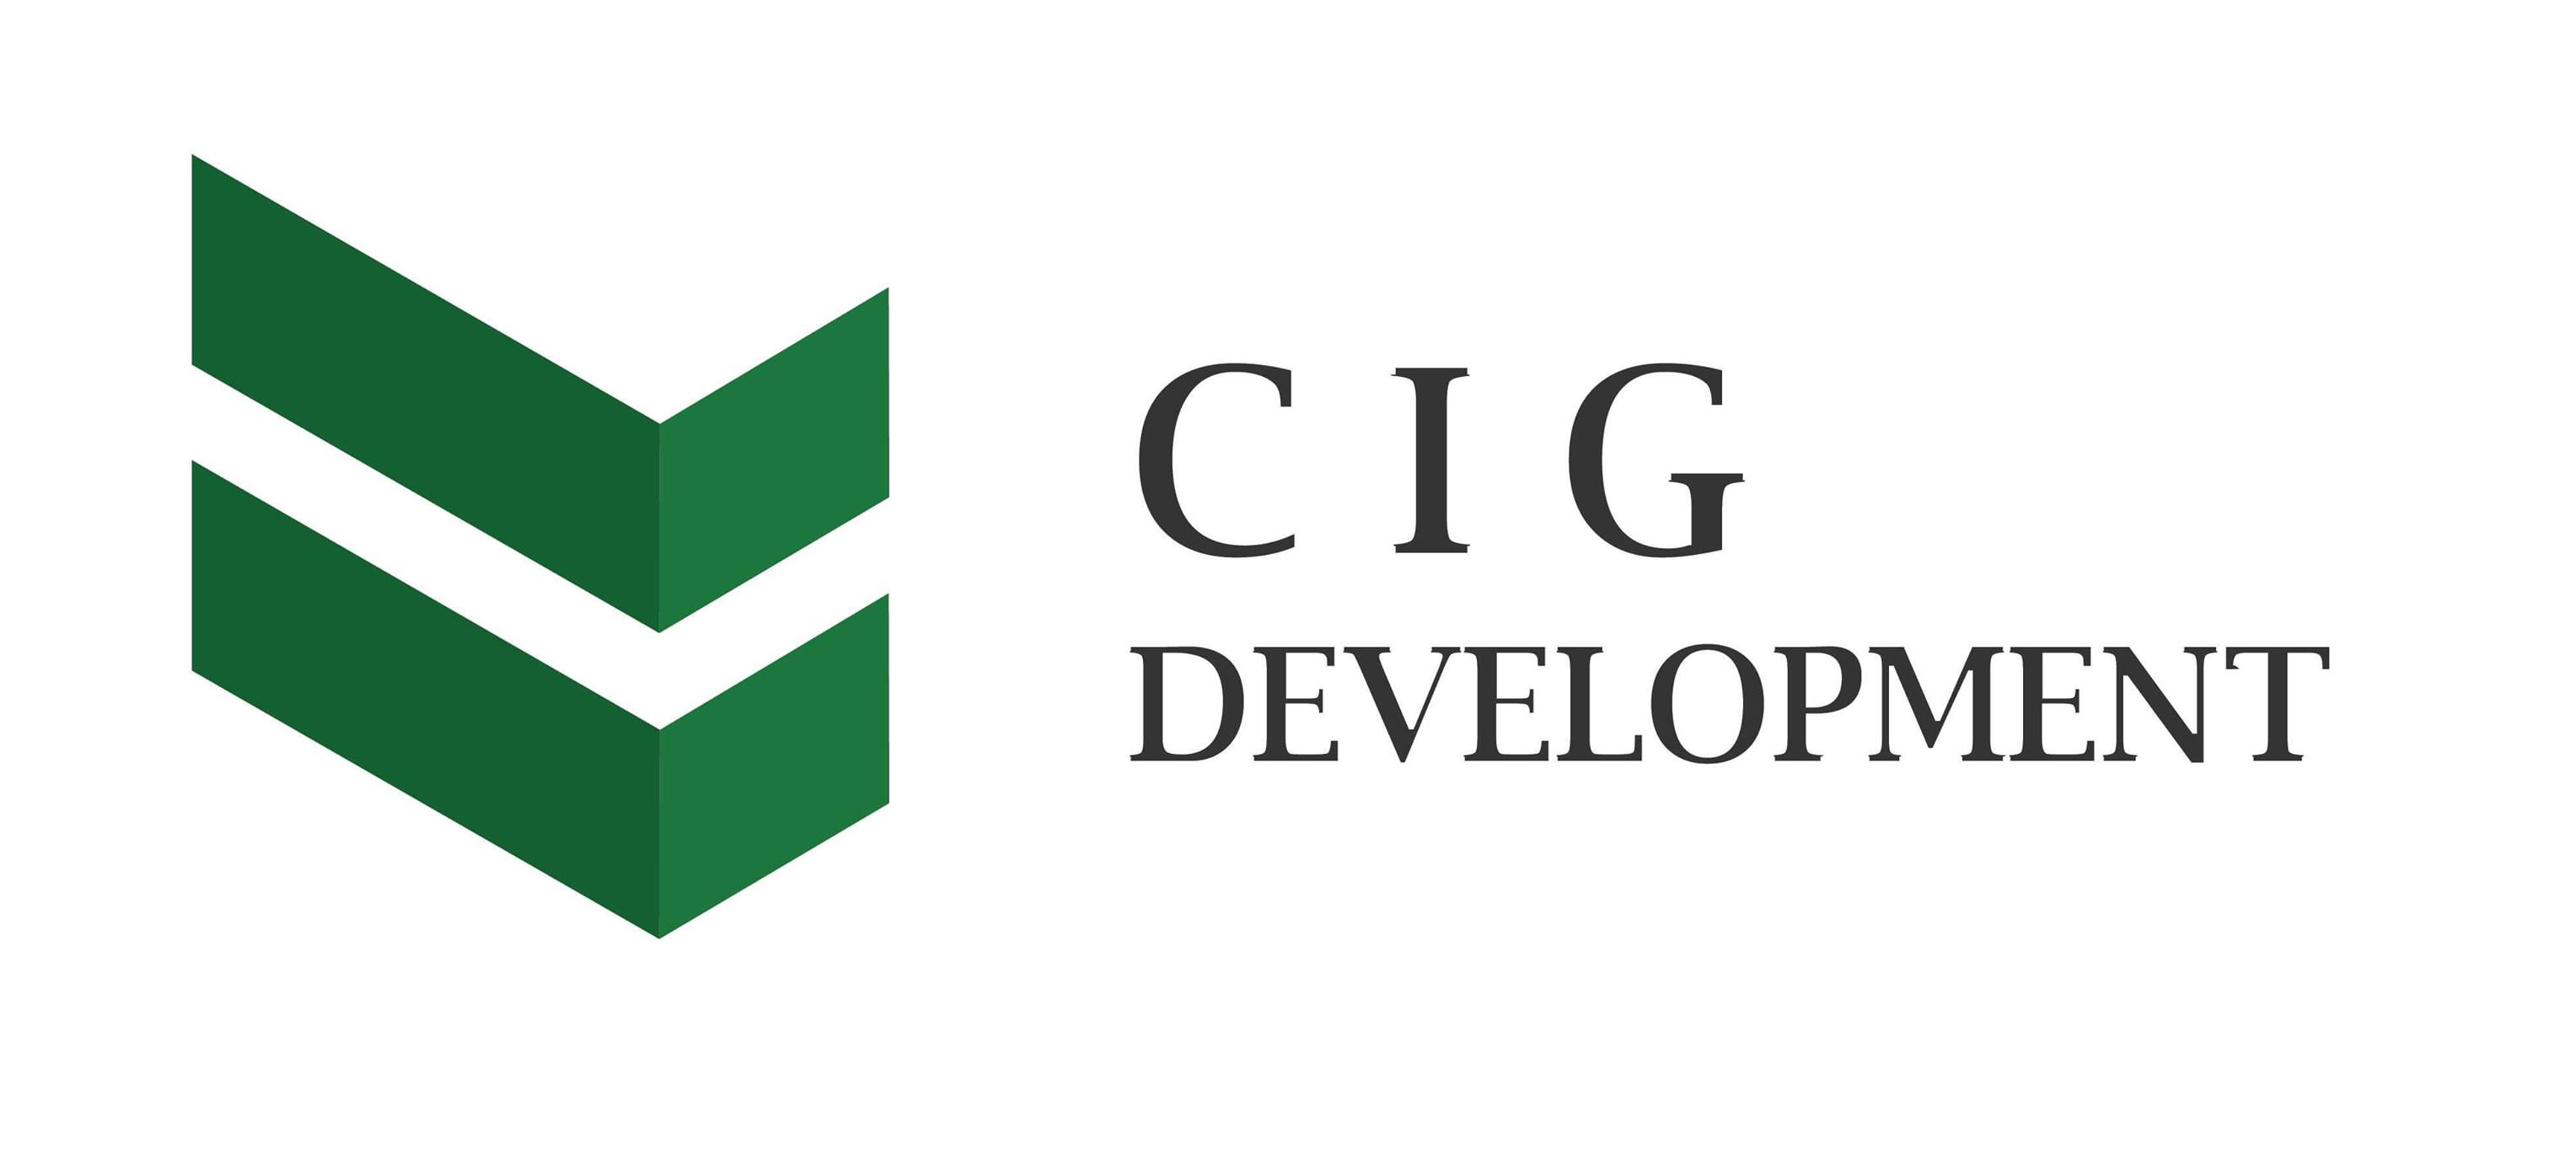 CIG Development